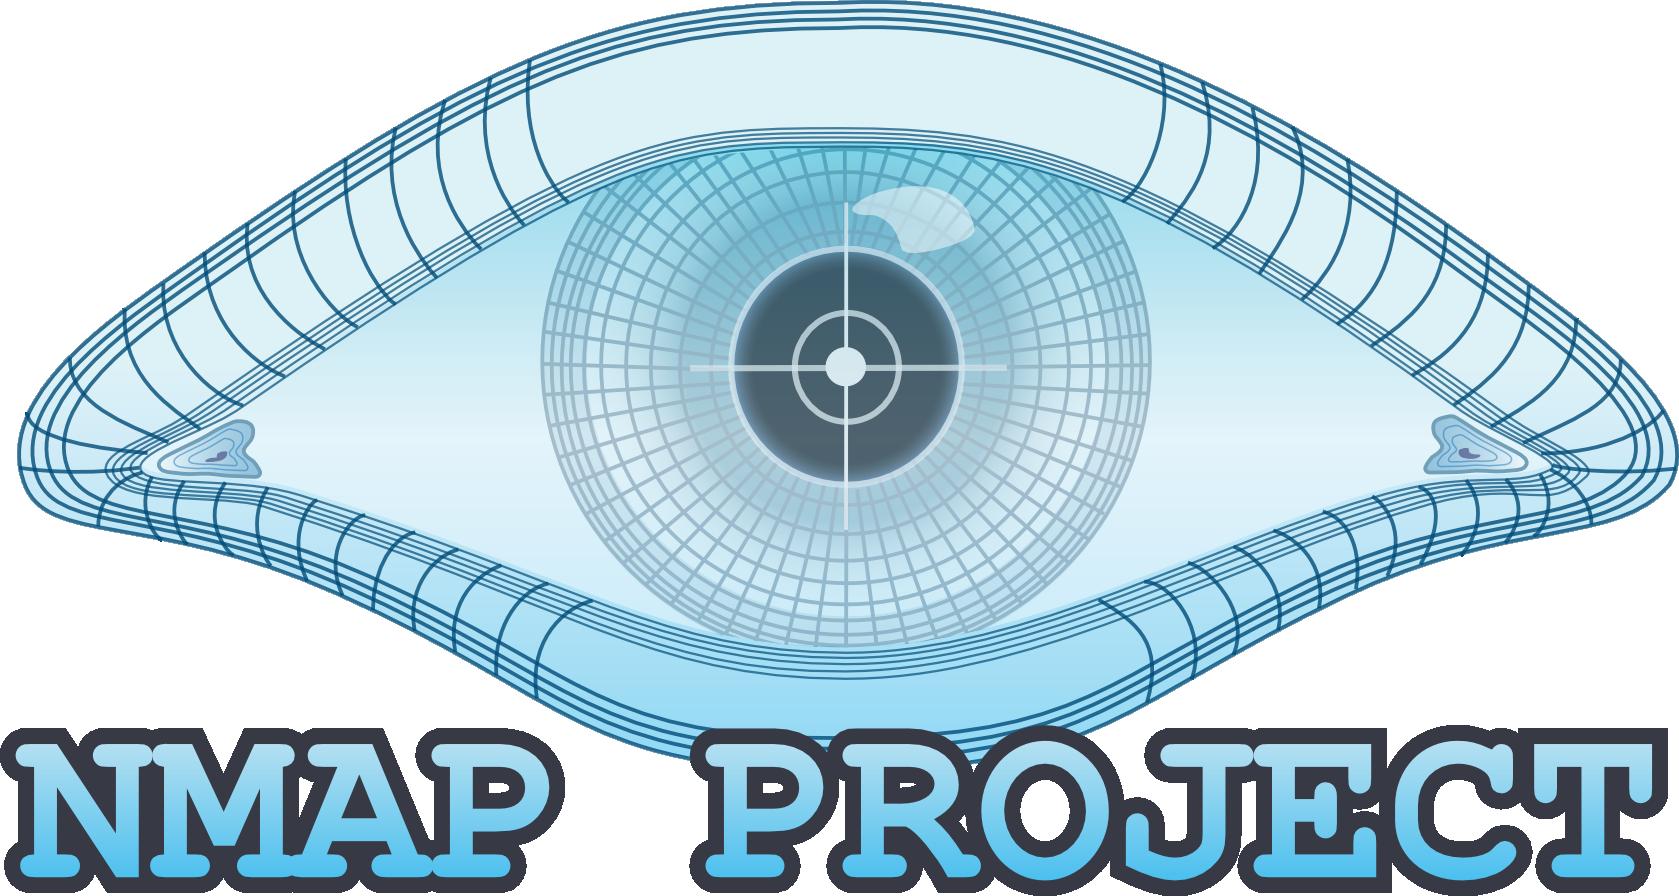 Nmap Online Scanner